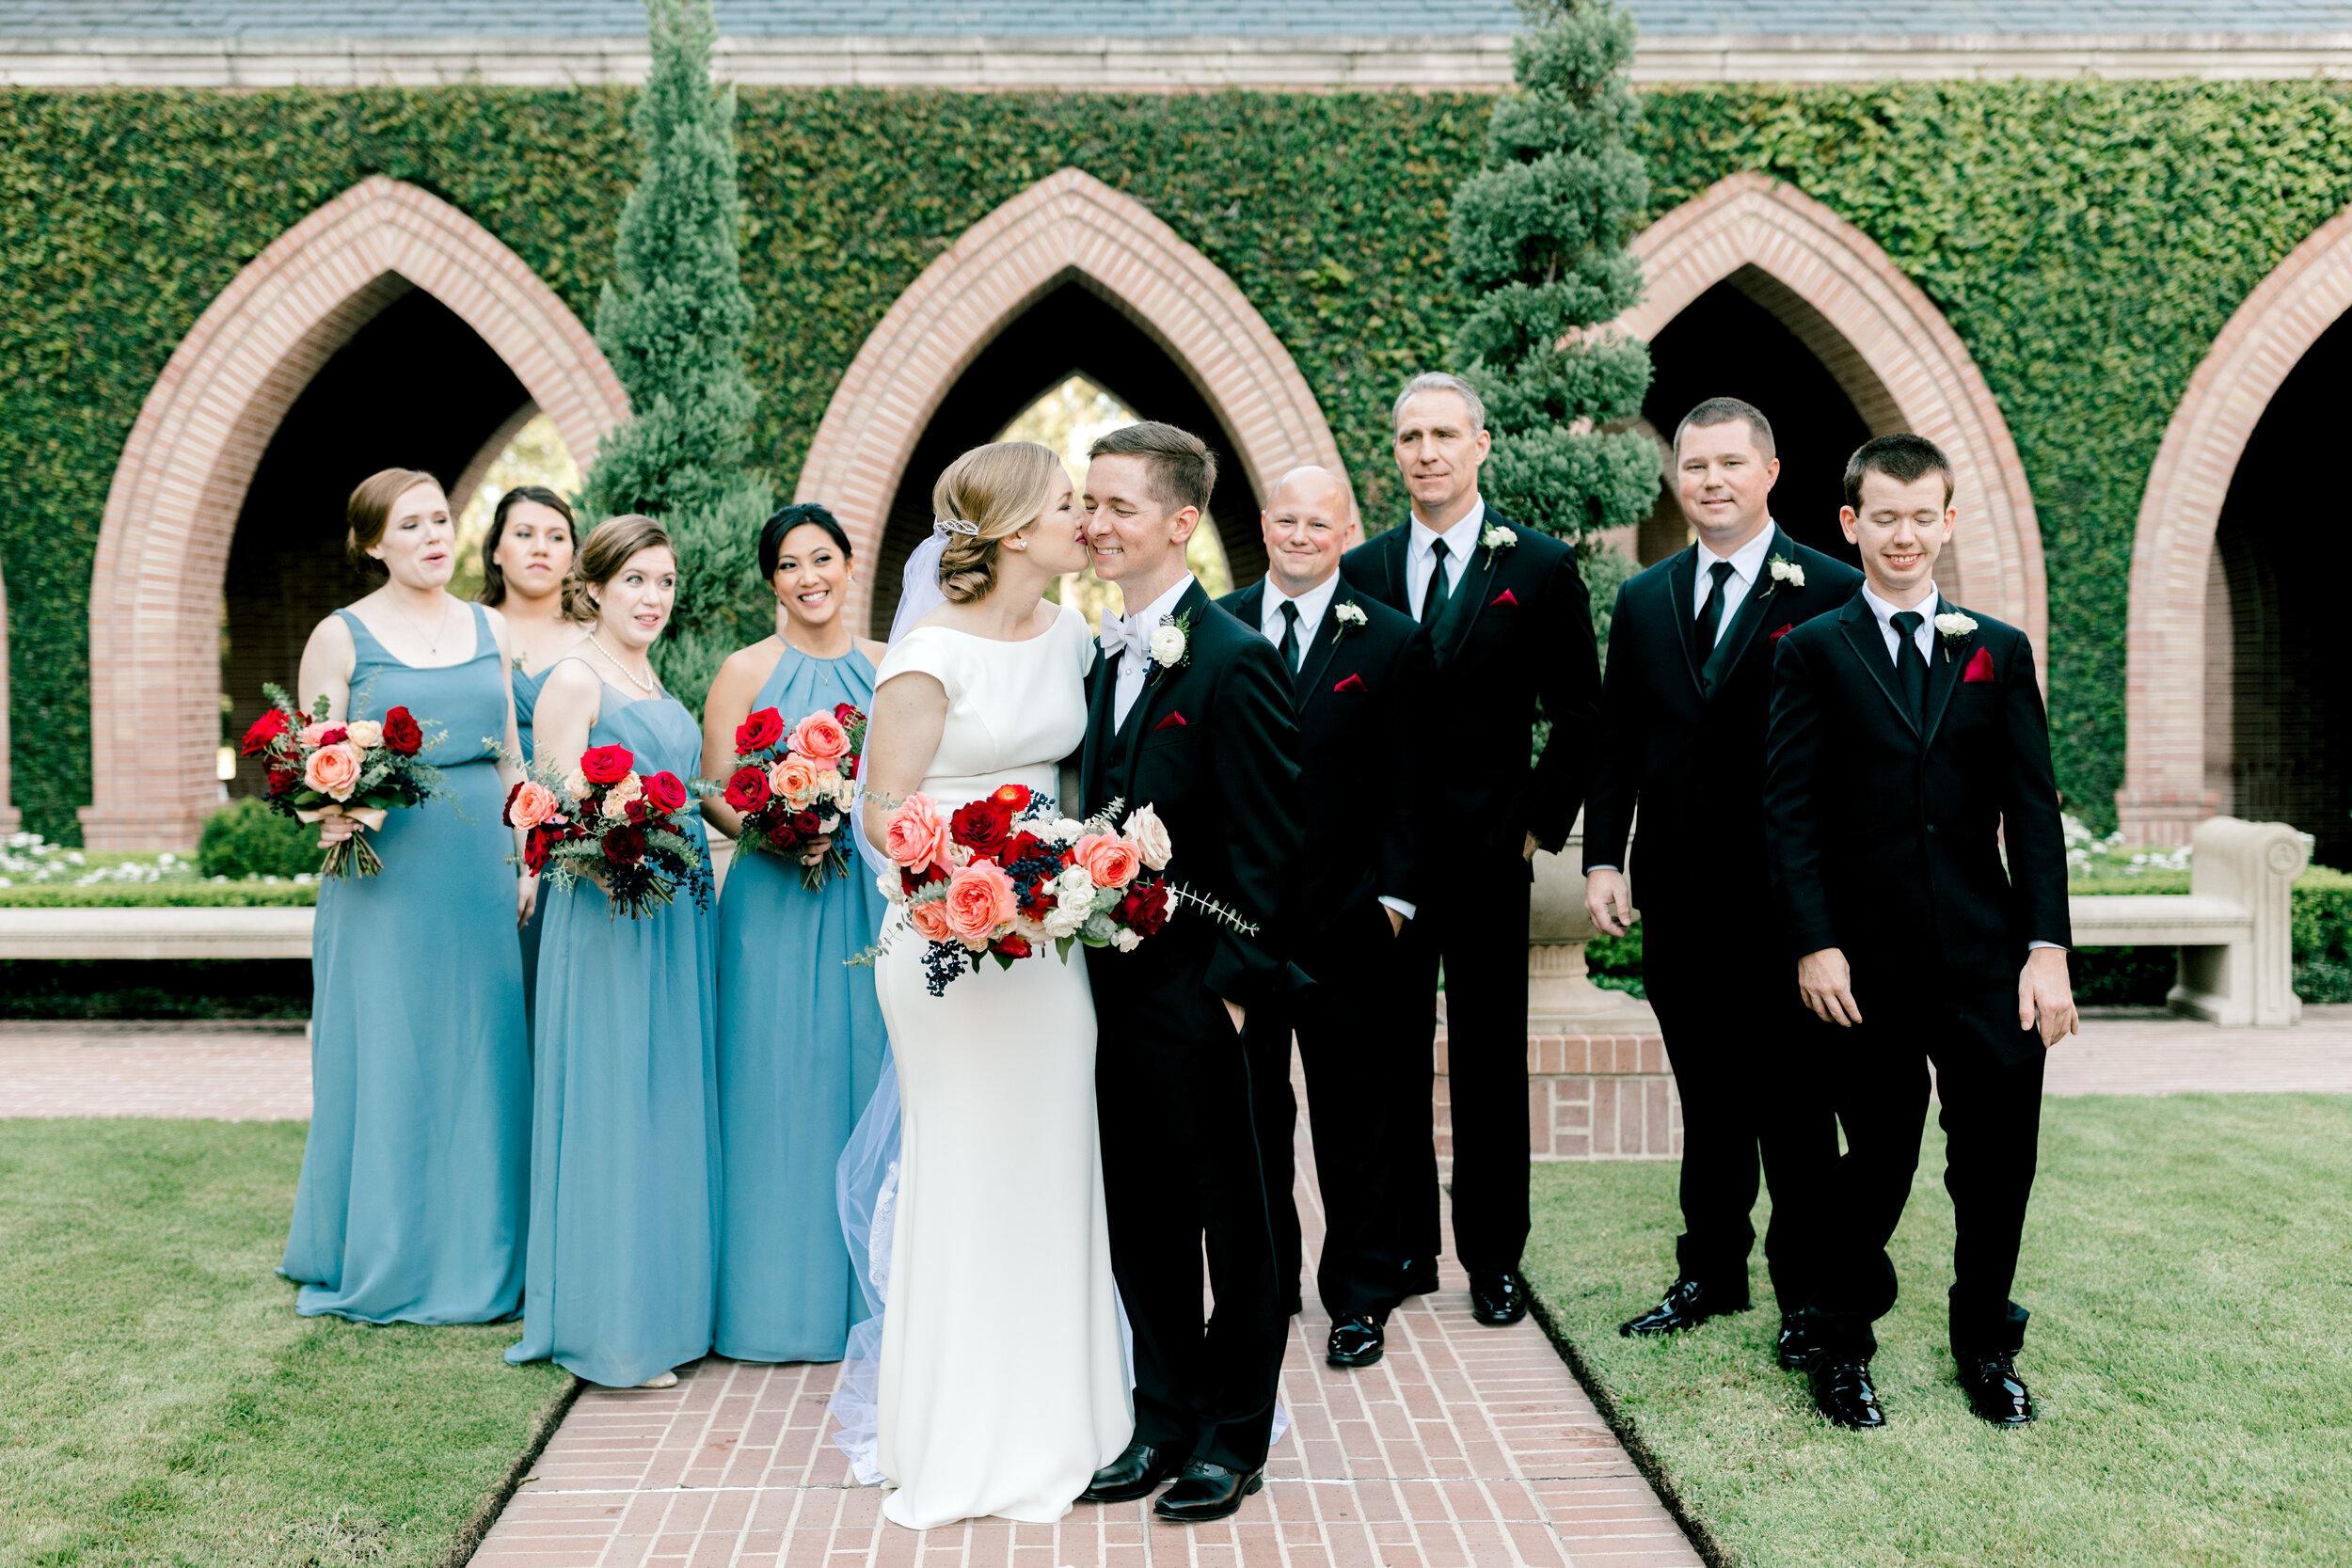 Houston Wedding Planner Piper & Muse